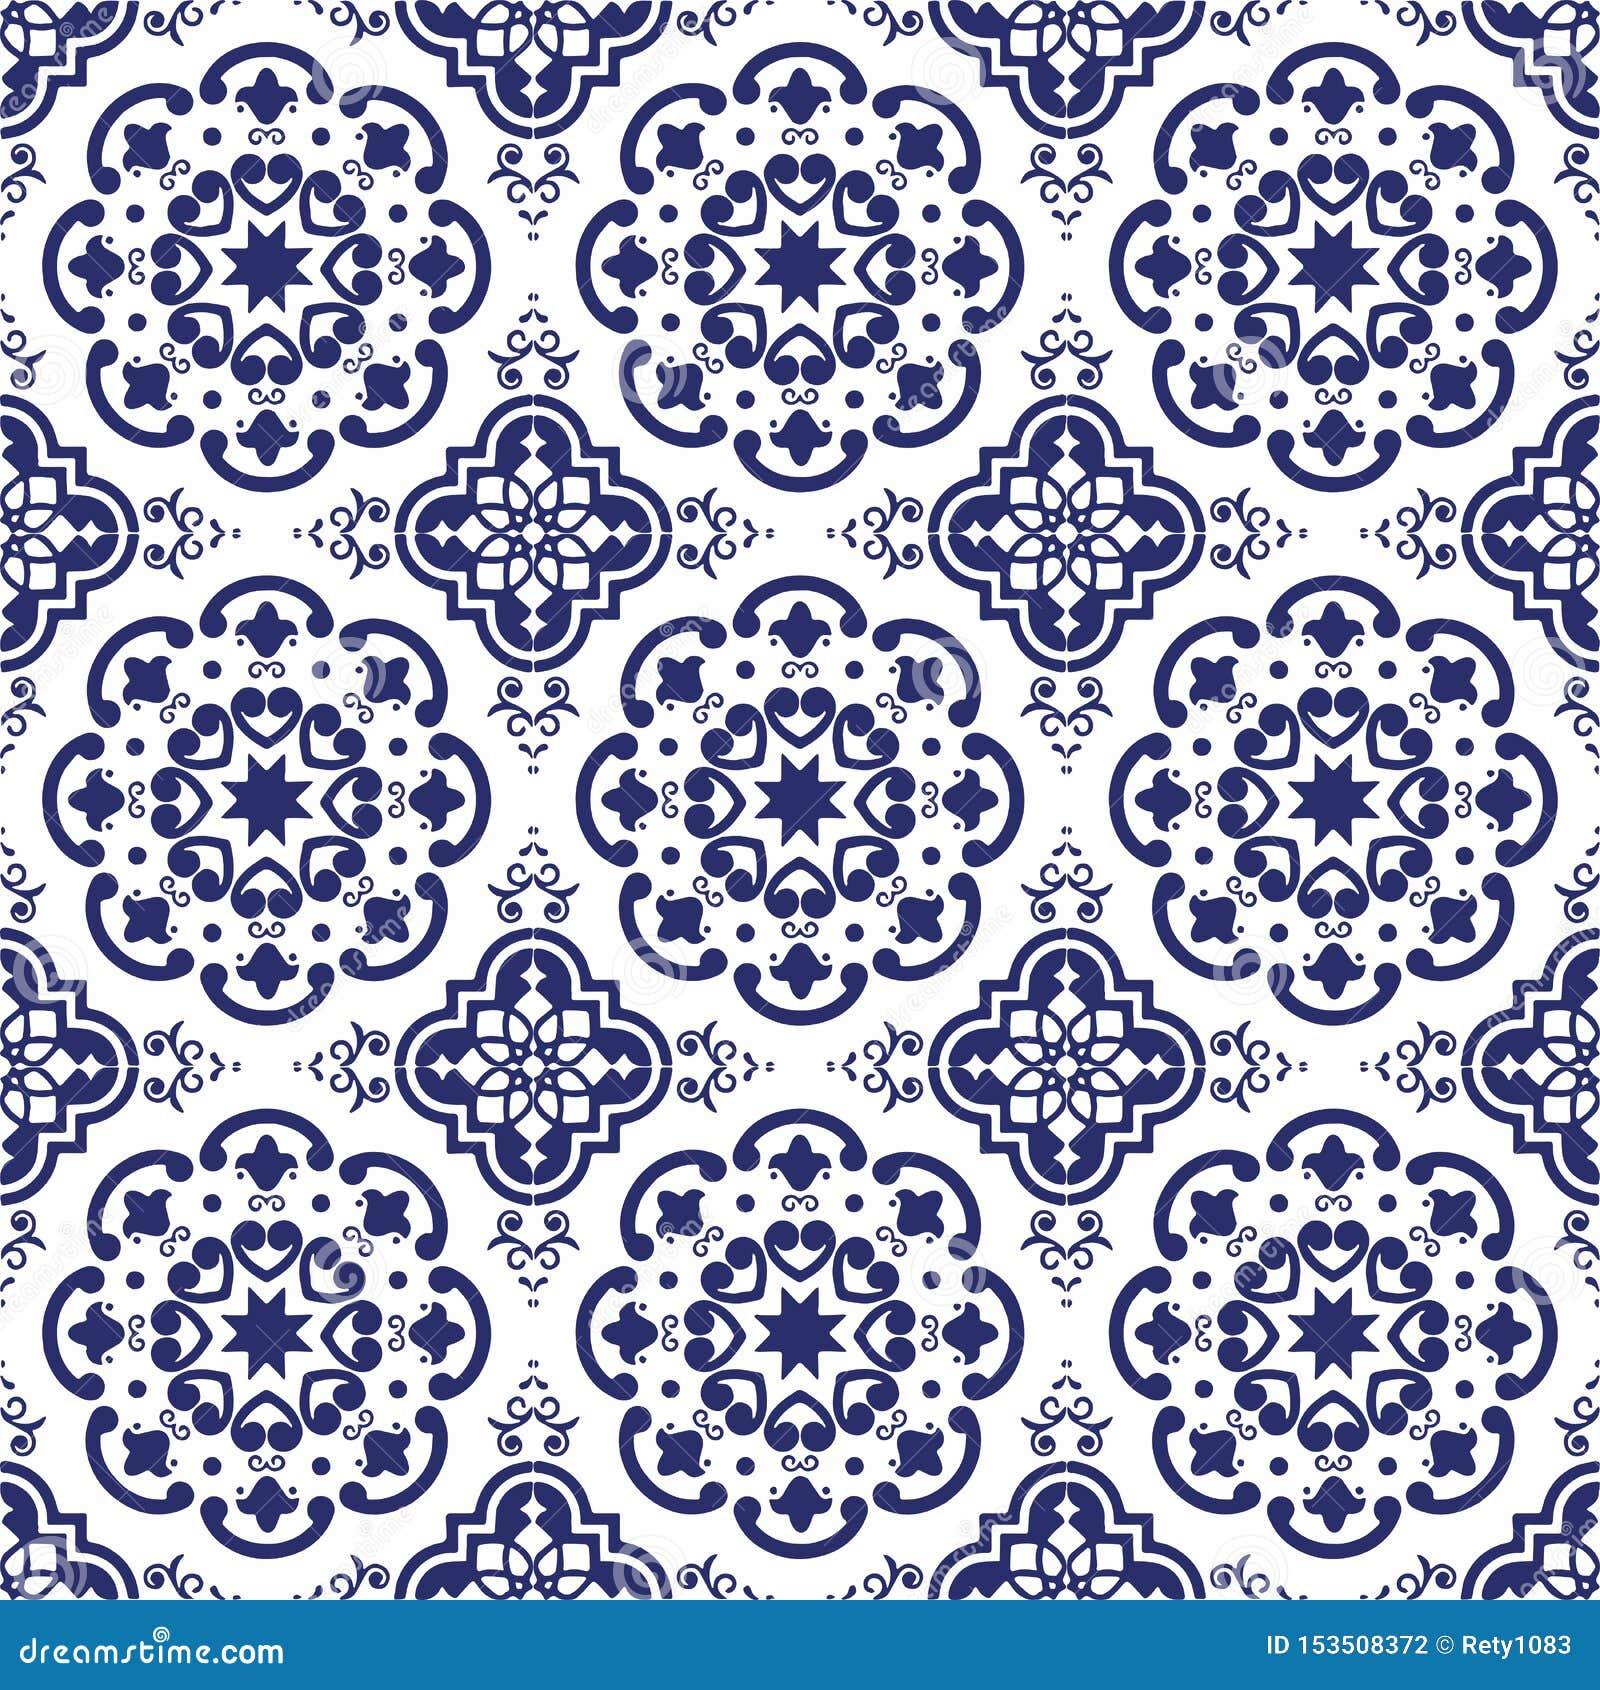 Ceramic Tile Portuguese Tiles Blue And White Moroccan Tiles Blue And White Kitchen Tiles Bathroom Tiles Surface Pattern Vector Stock Vector Illustration Of Blue Tiles 153508372